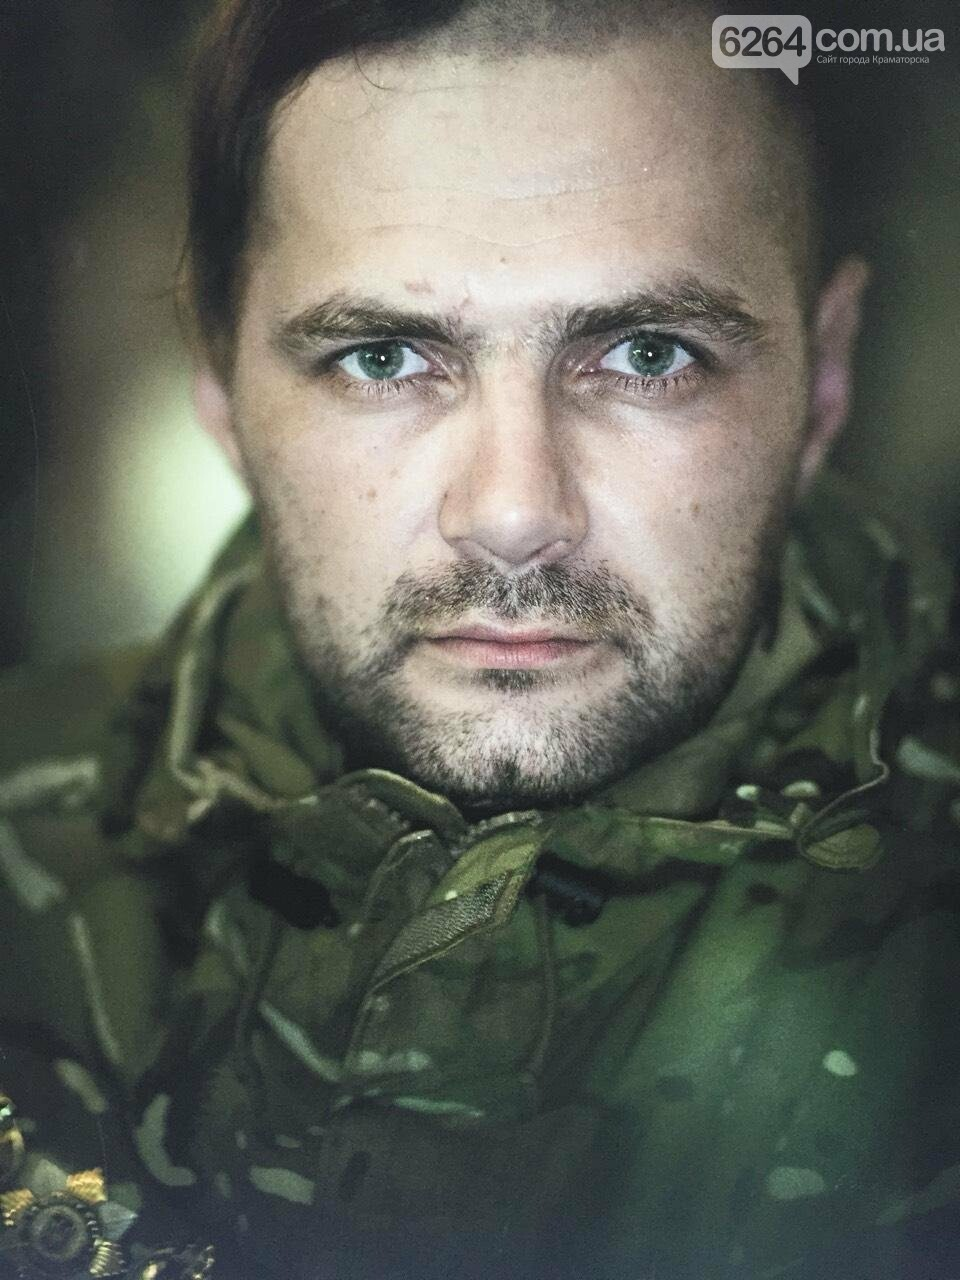 В Краматорске проходит выставка «Портрет солдата», фото-4